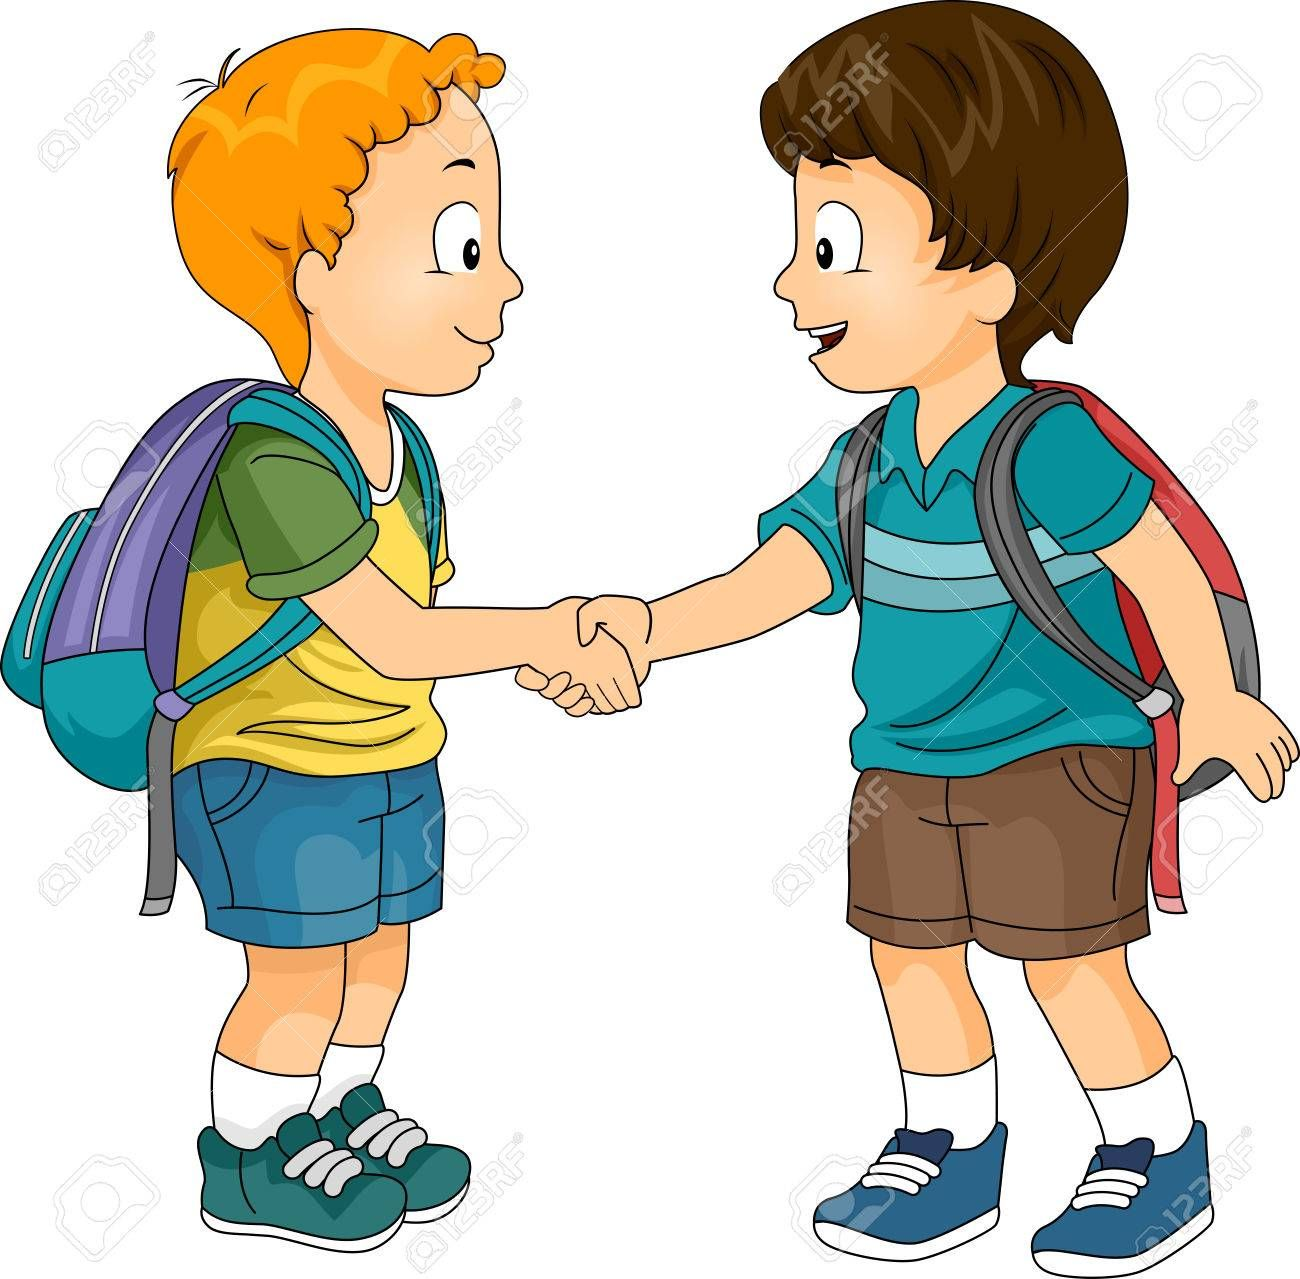 Illustration Of Little Boys Shaking Hands Spon Boys Illustration Hands Shaking Friend Cartoon Islamic Cartoon Clipart Boy